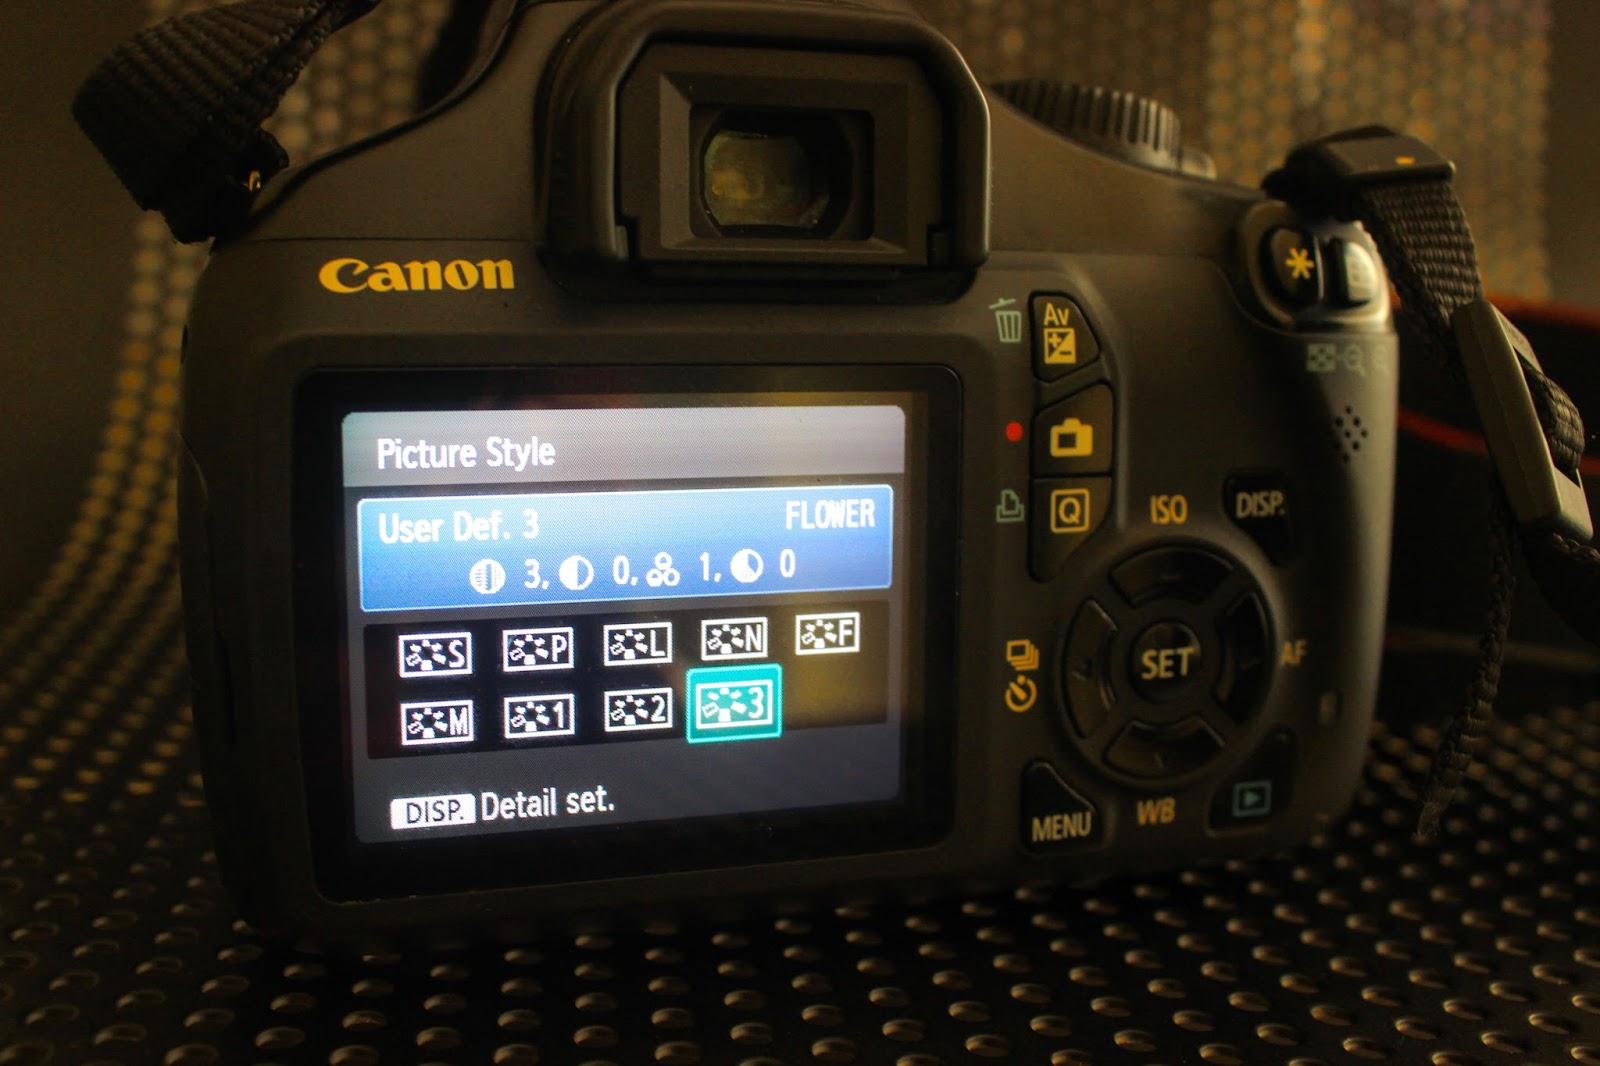 Cara Mengisi Picture Style Pada Kamera Dslr Canon Blog Banten Kamera